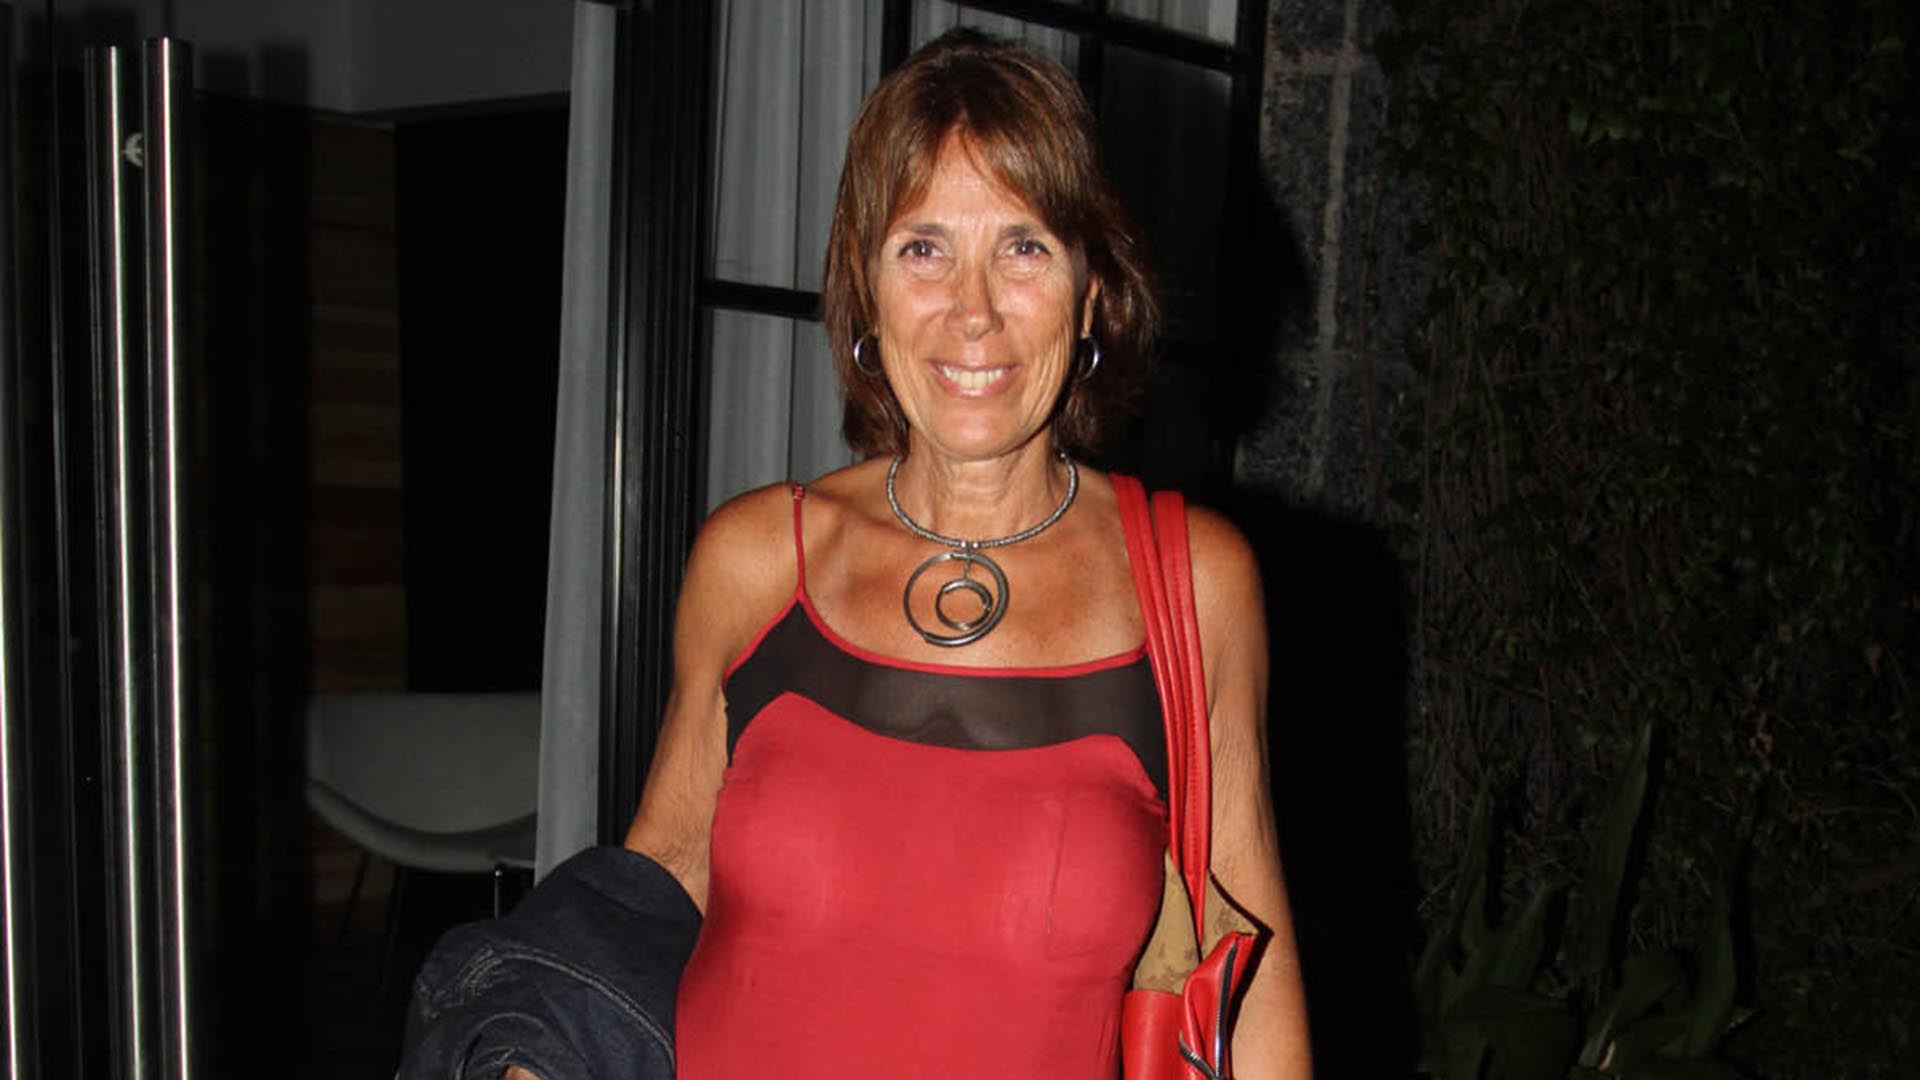 Marta Betoldi